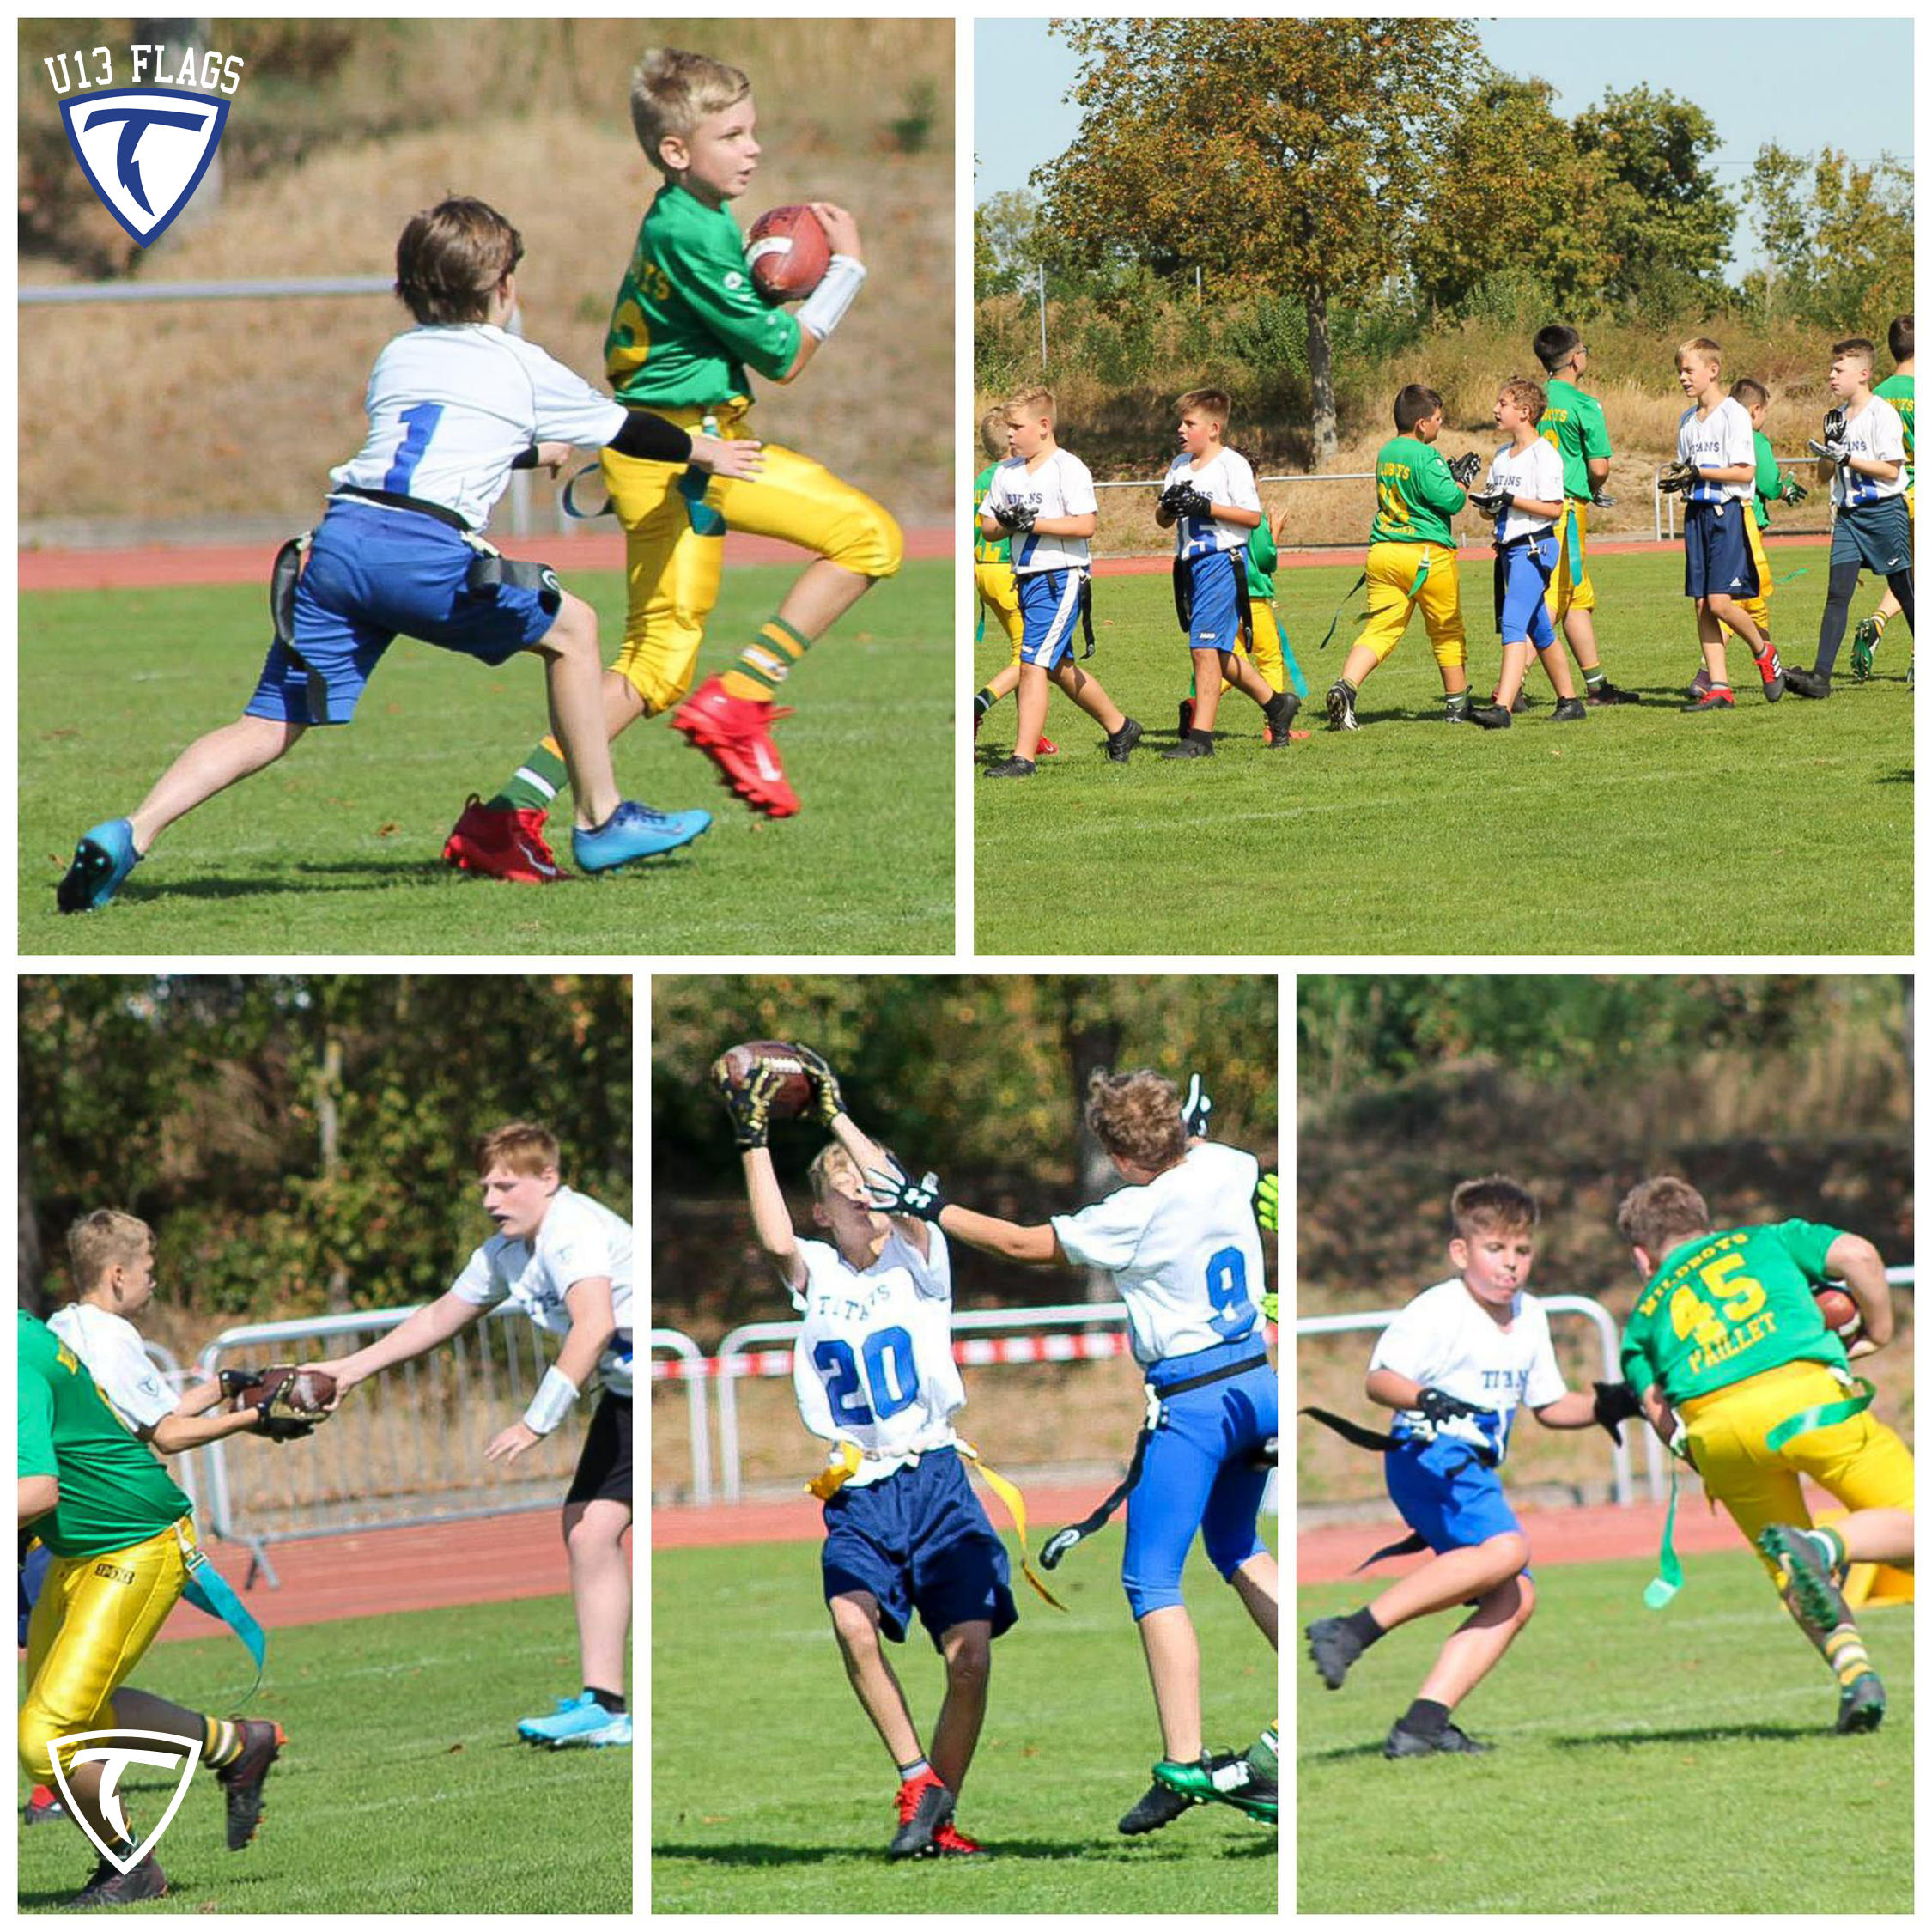 Unser U13-Flagfootballteam